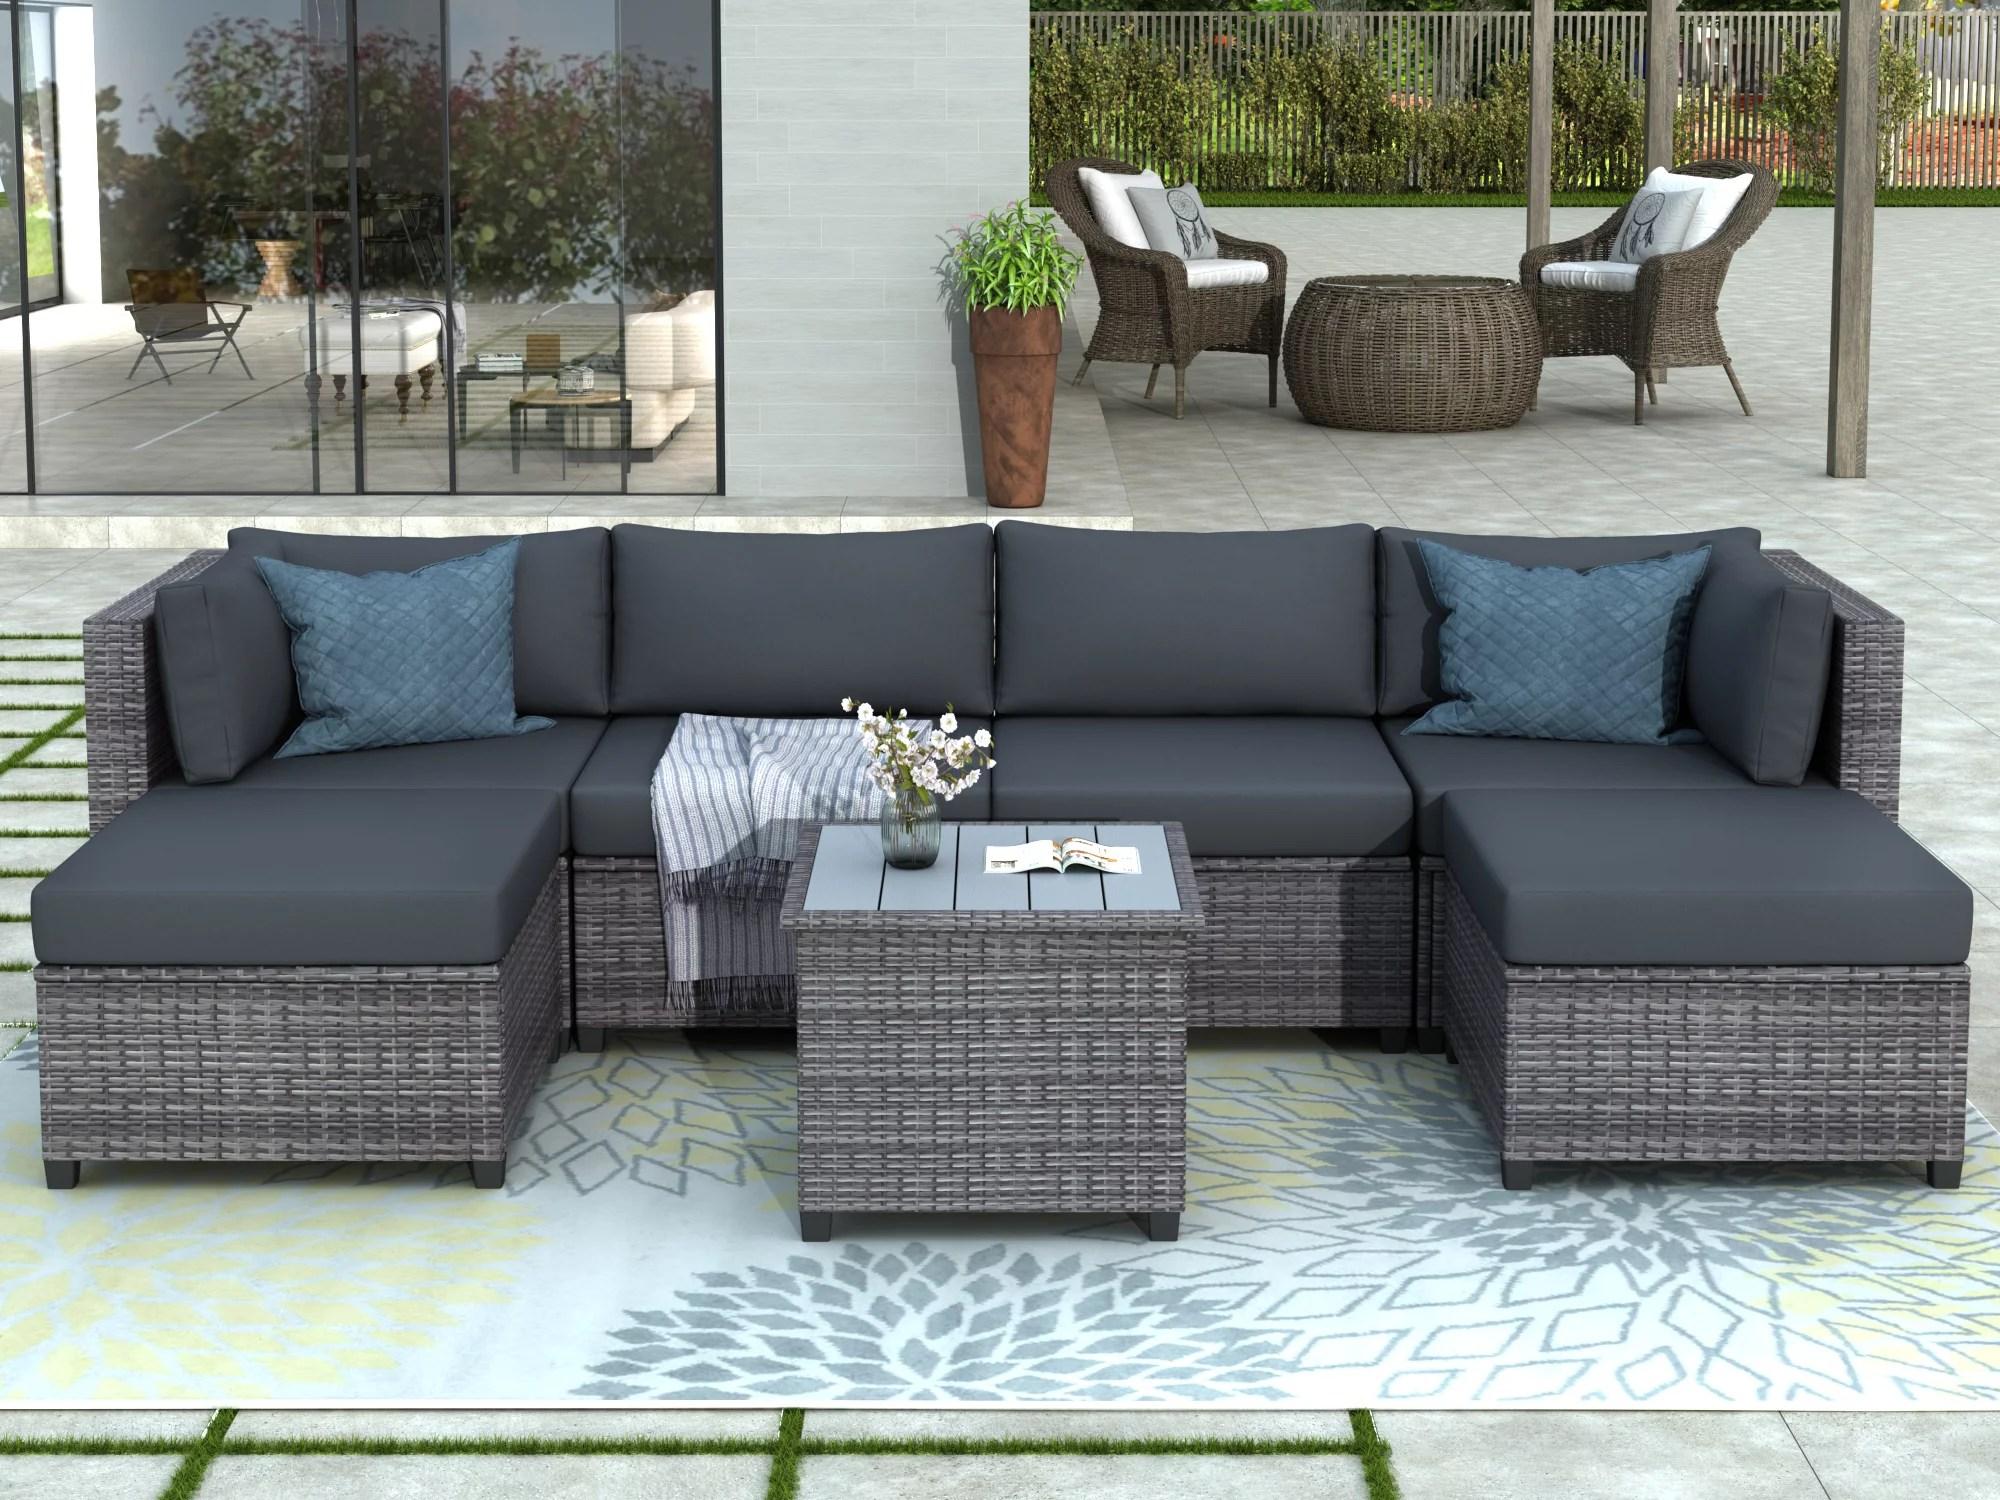 outdoor patio sectional sofa set 7